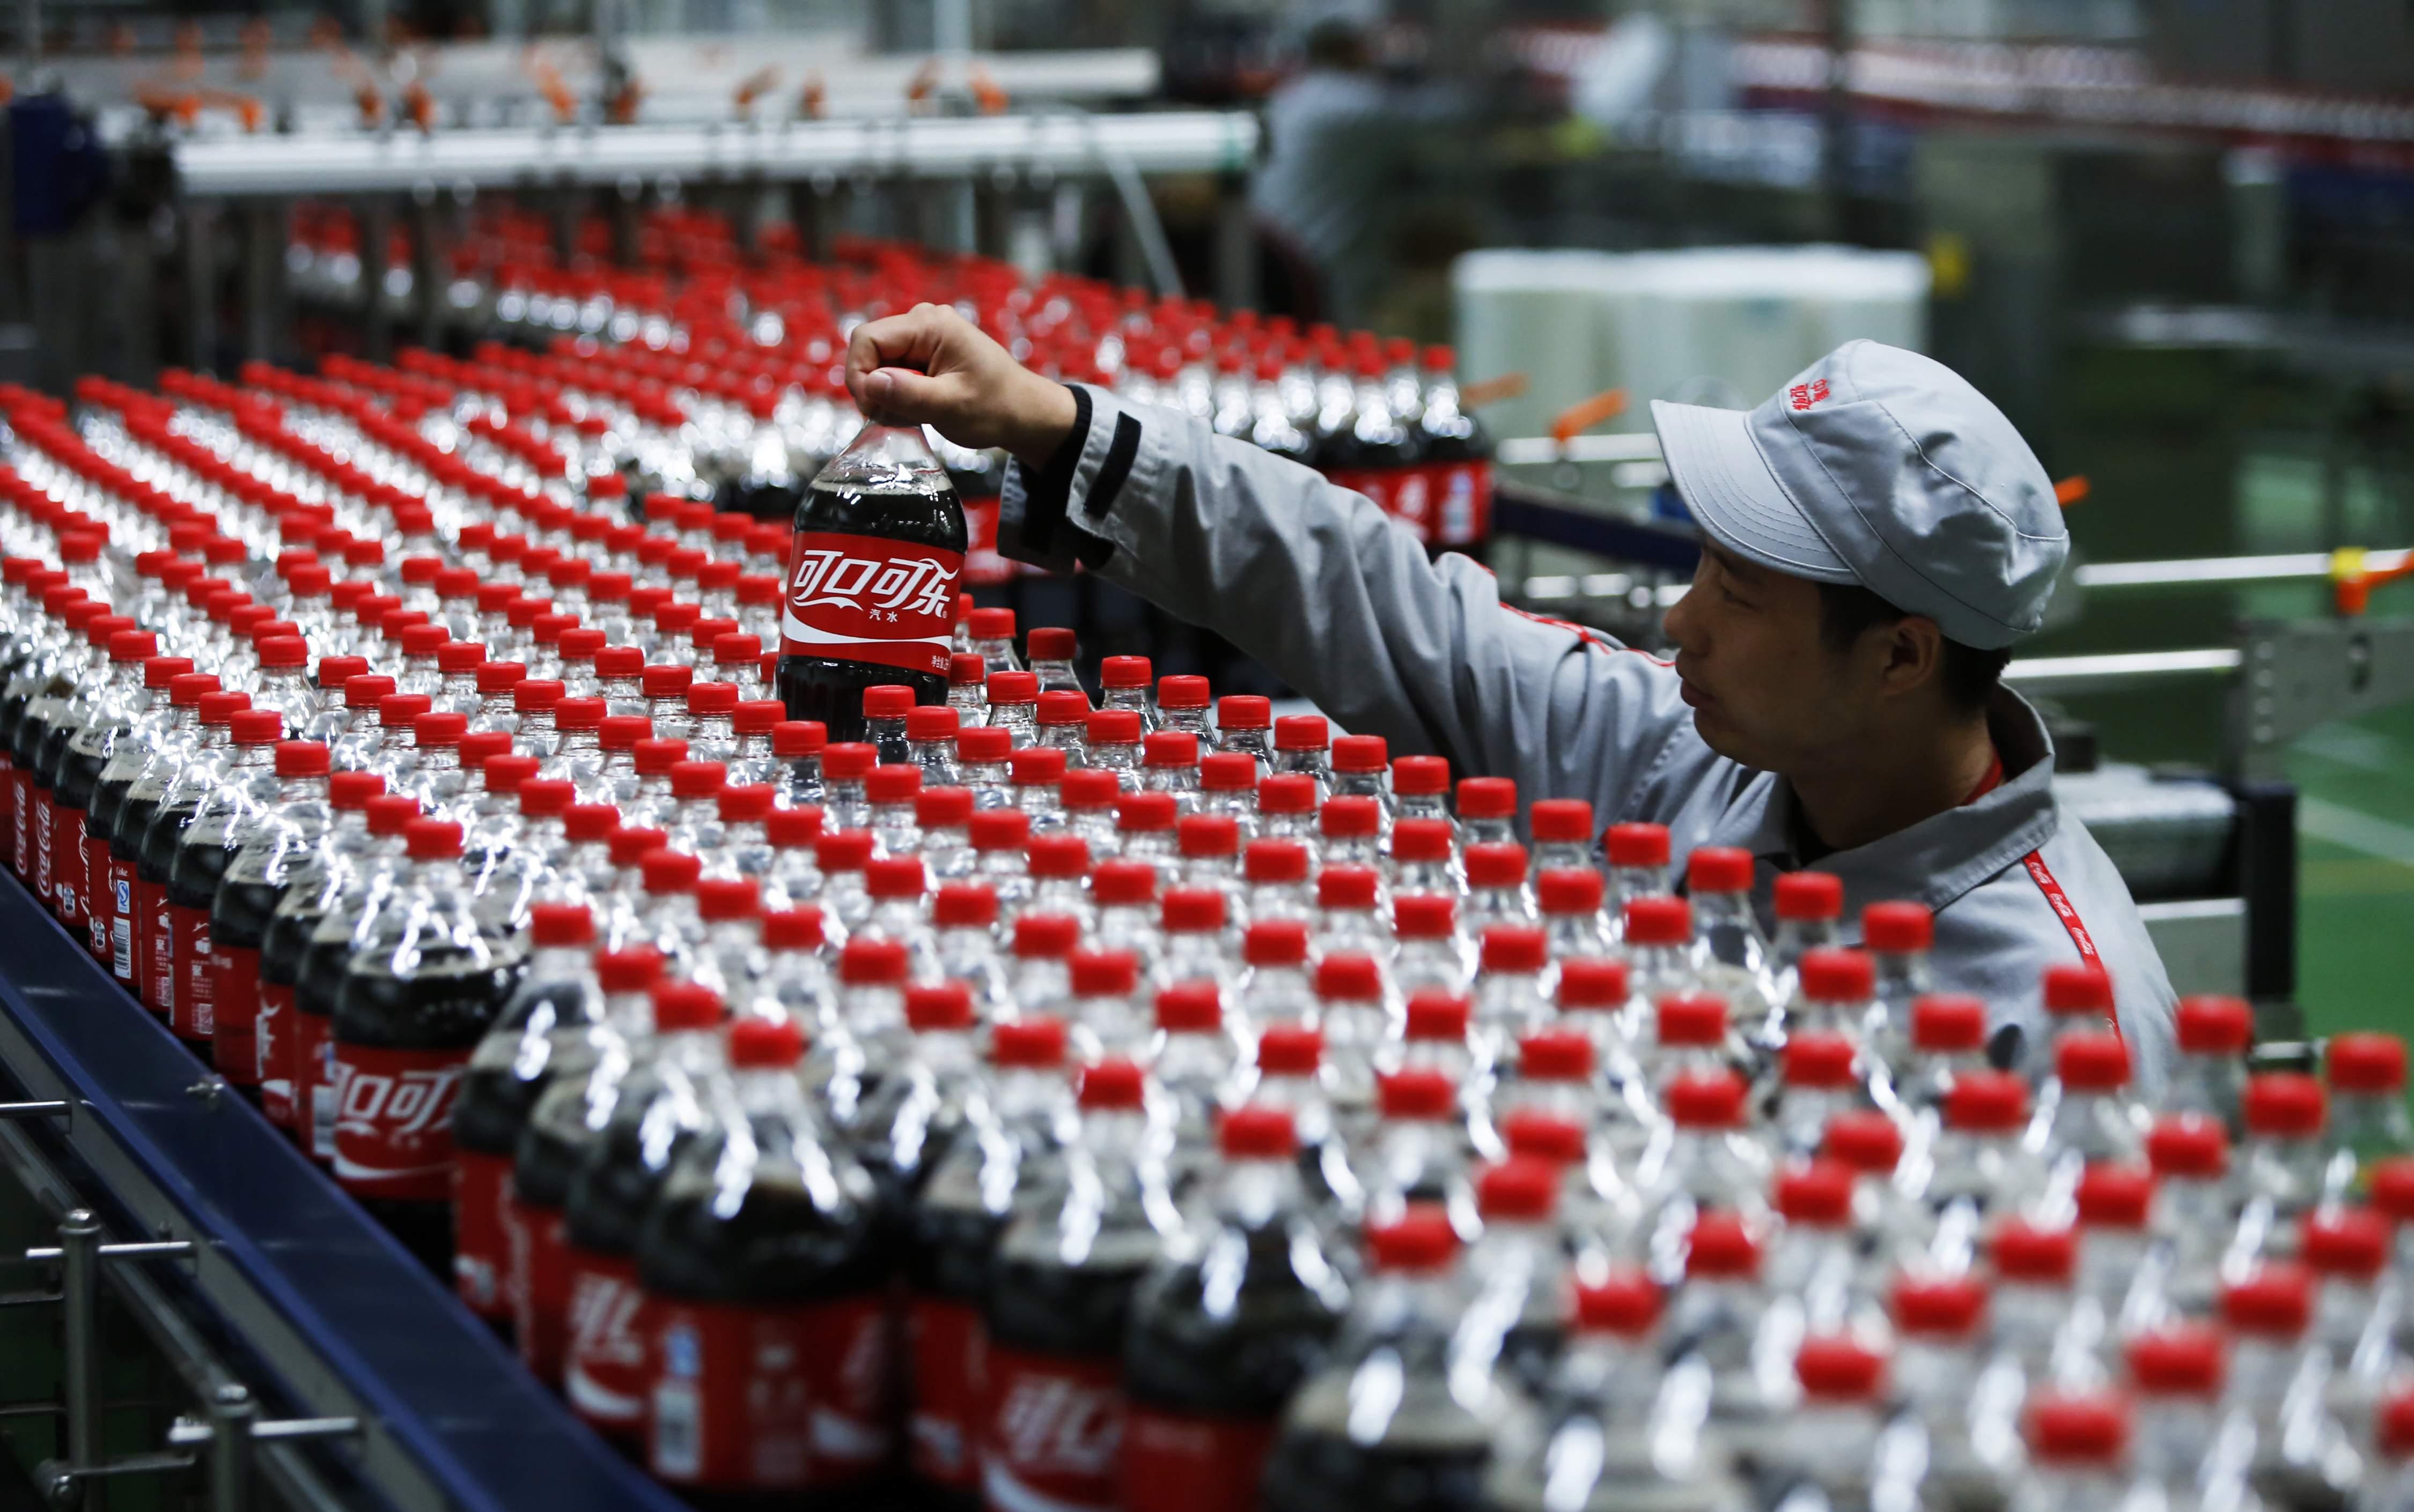 usine de coca cola